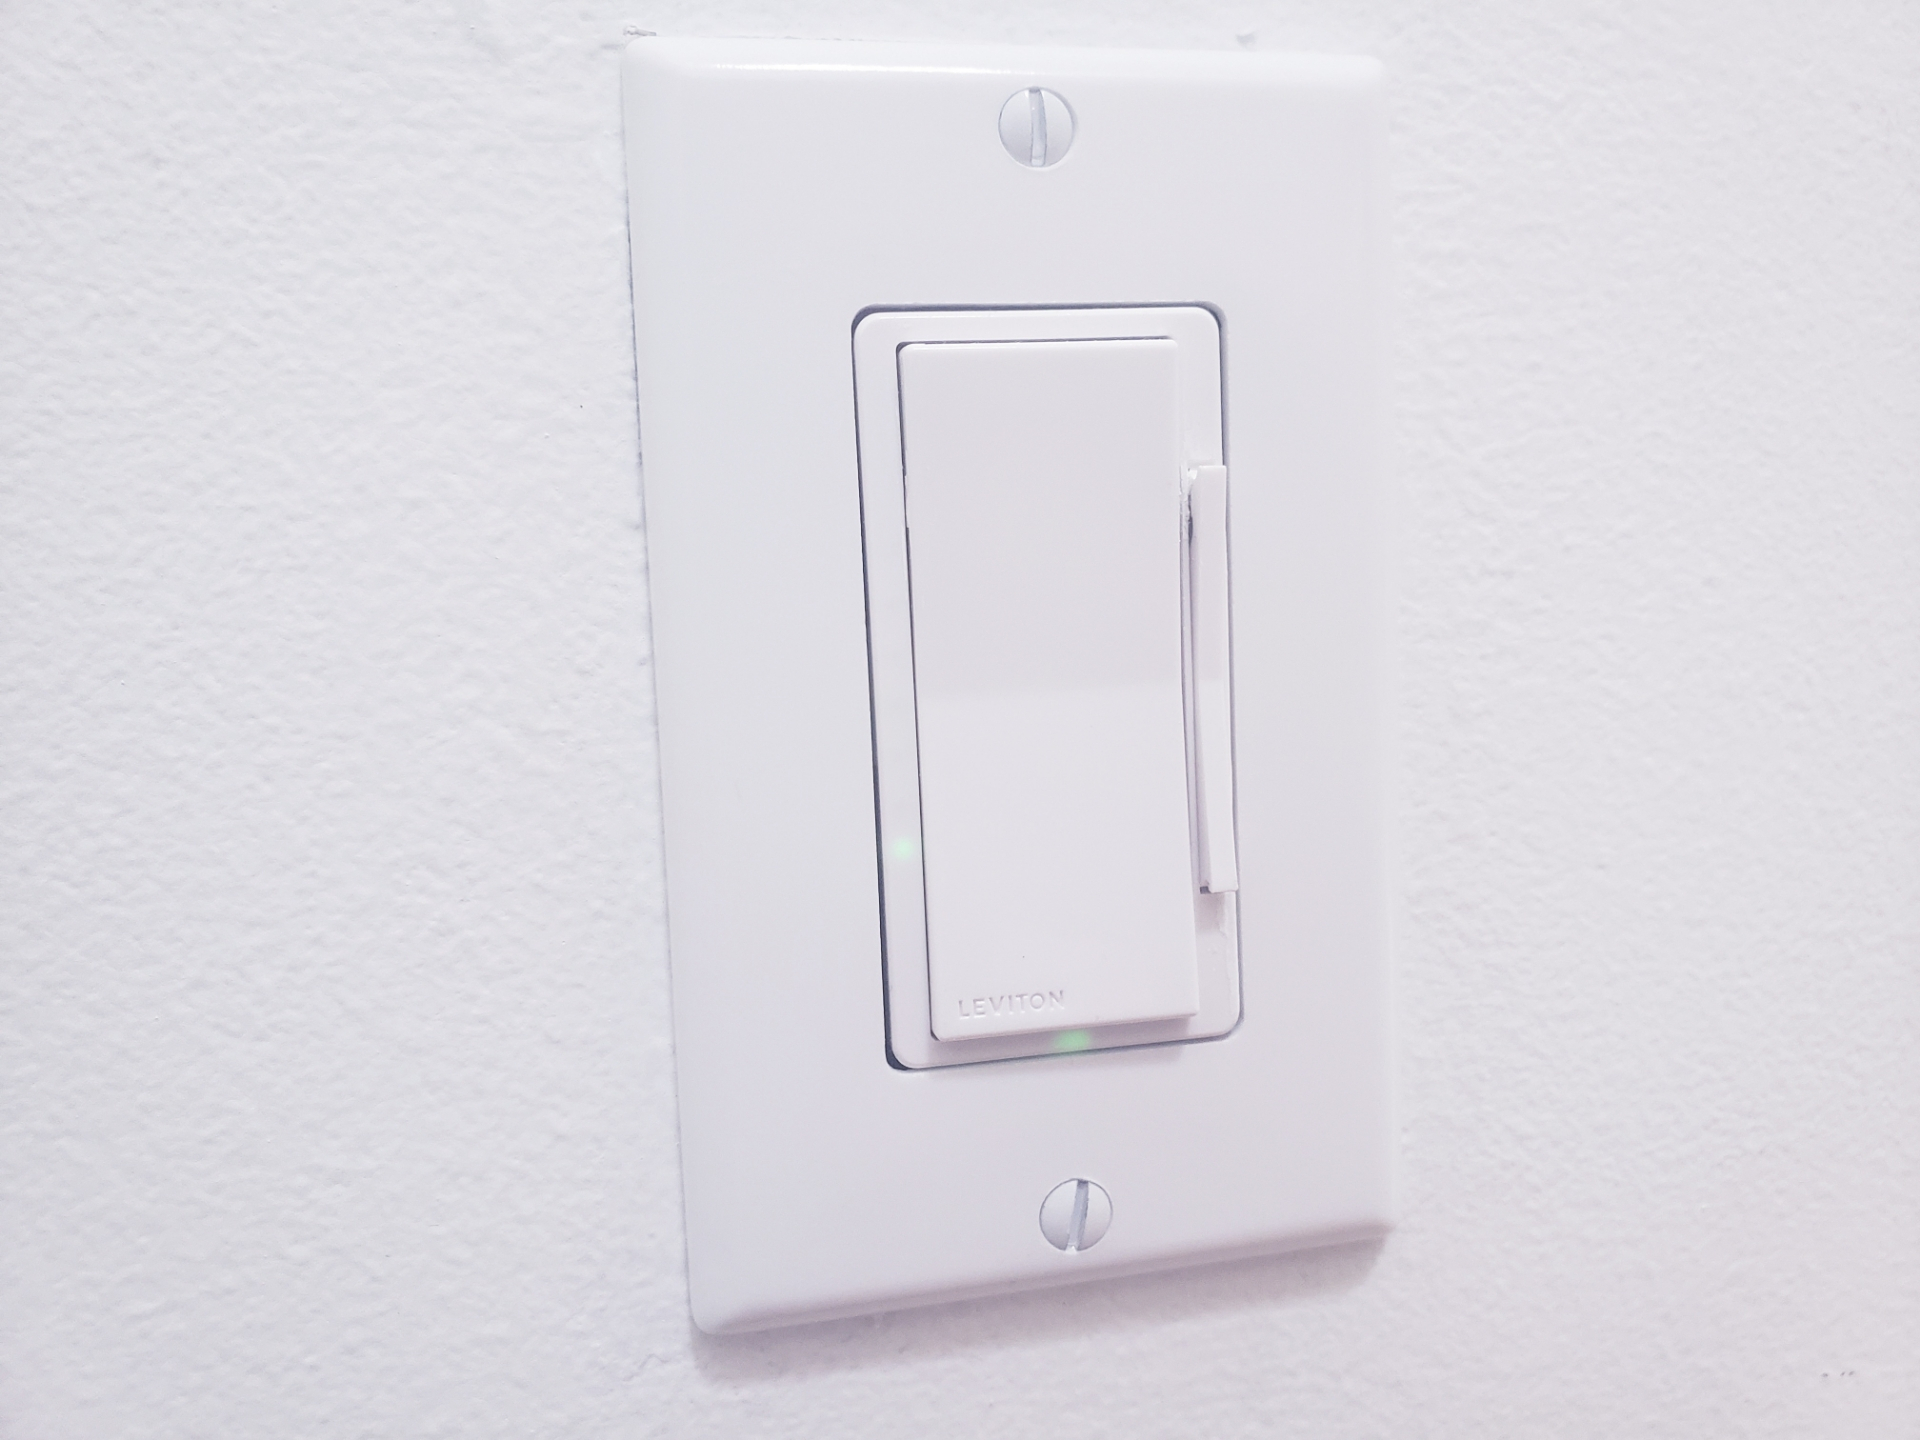 Leviton Smart Dimmer Switch  Installation